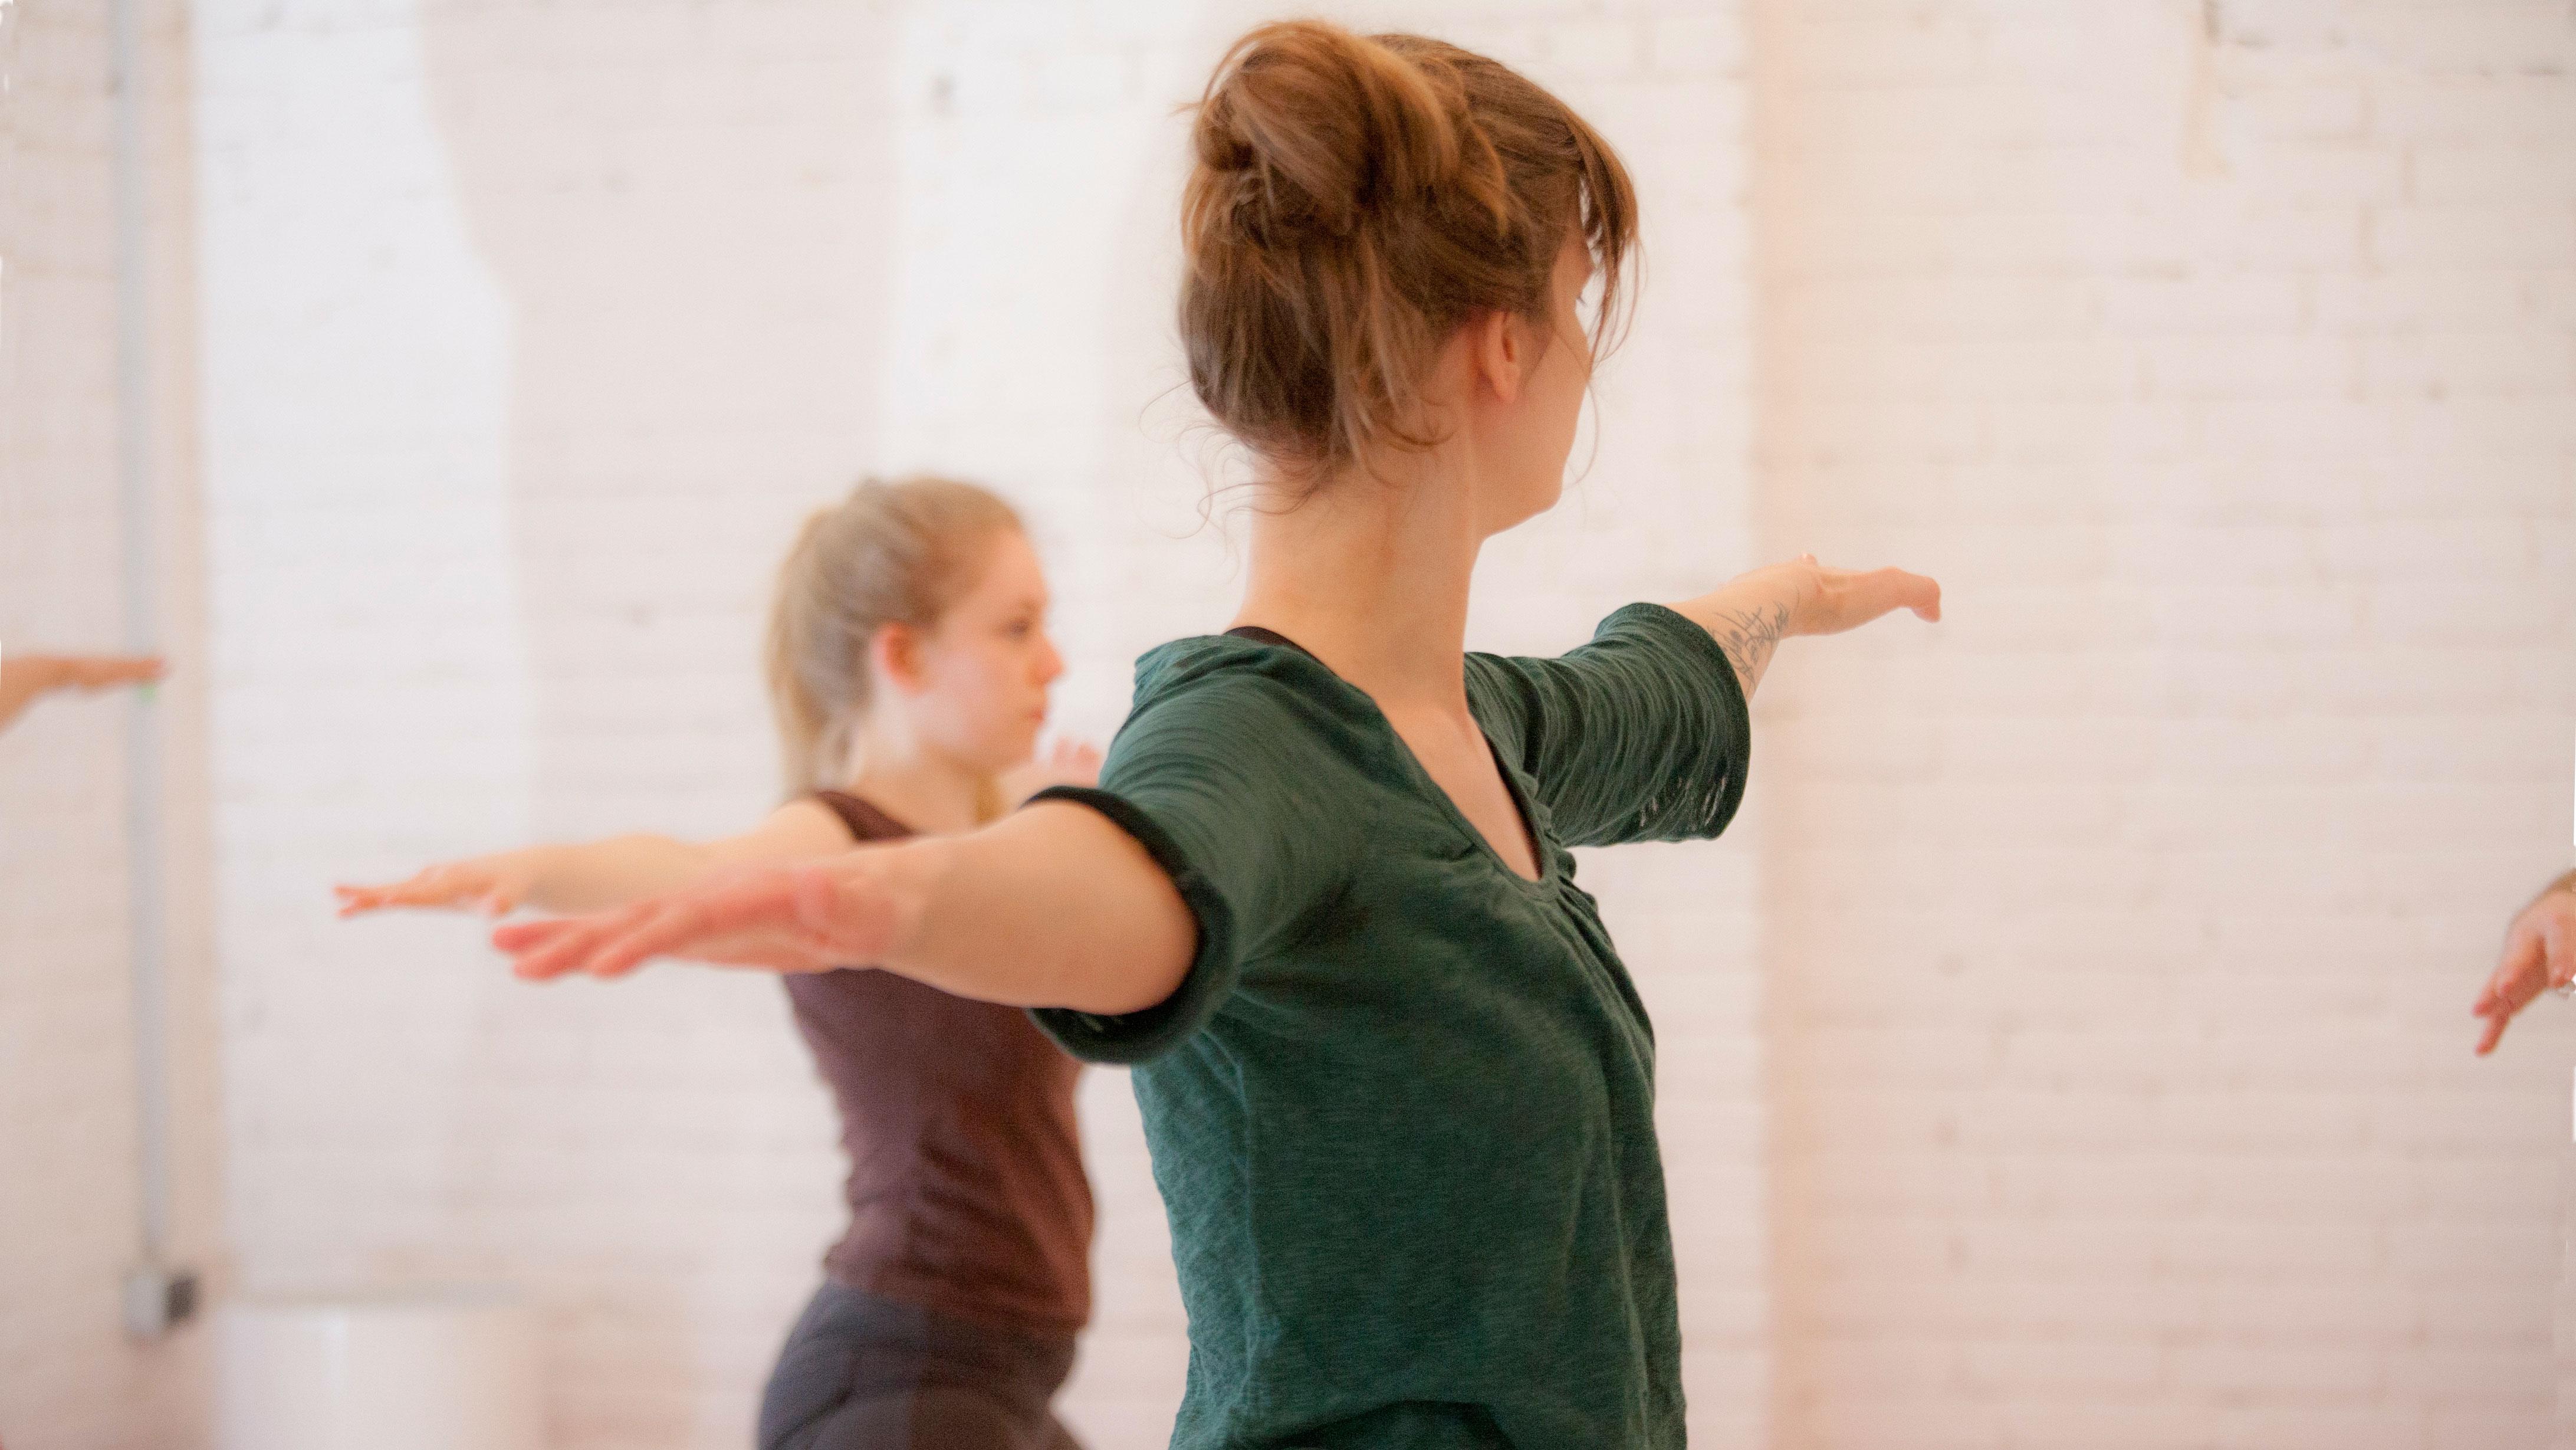 Yogakurs nach der Schwangerschaft